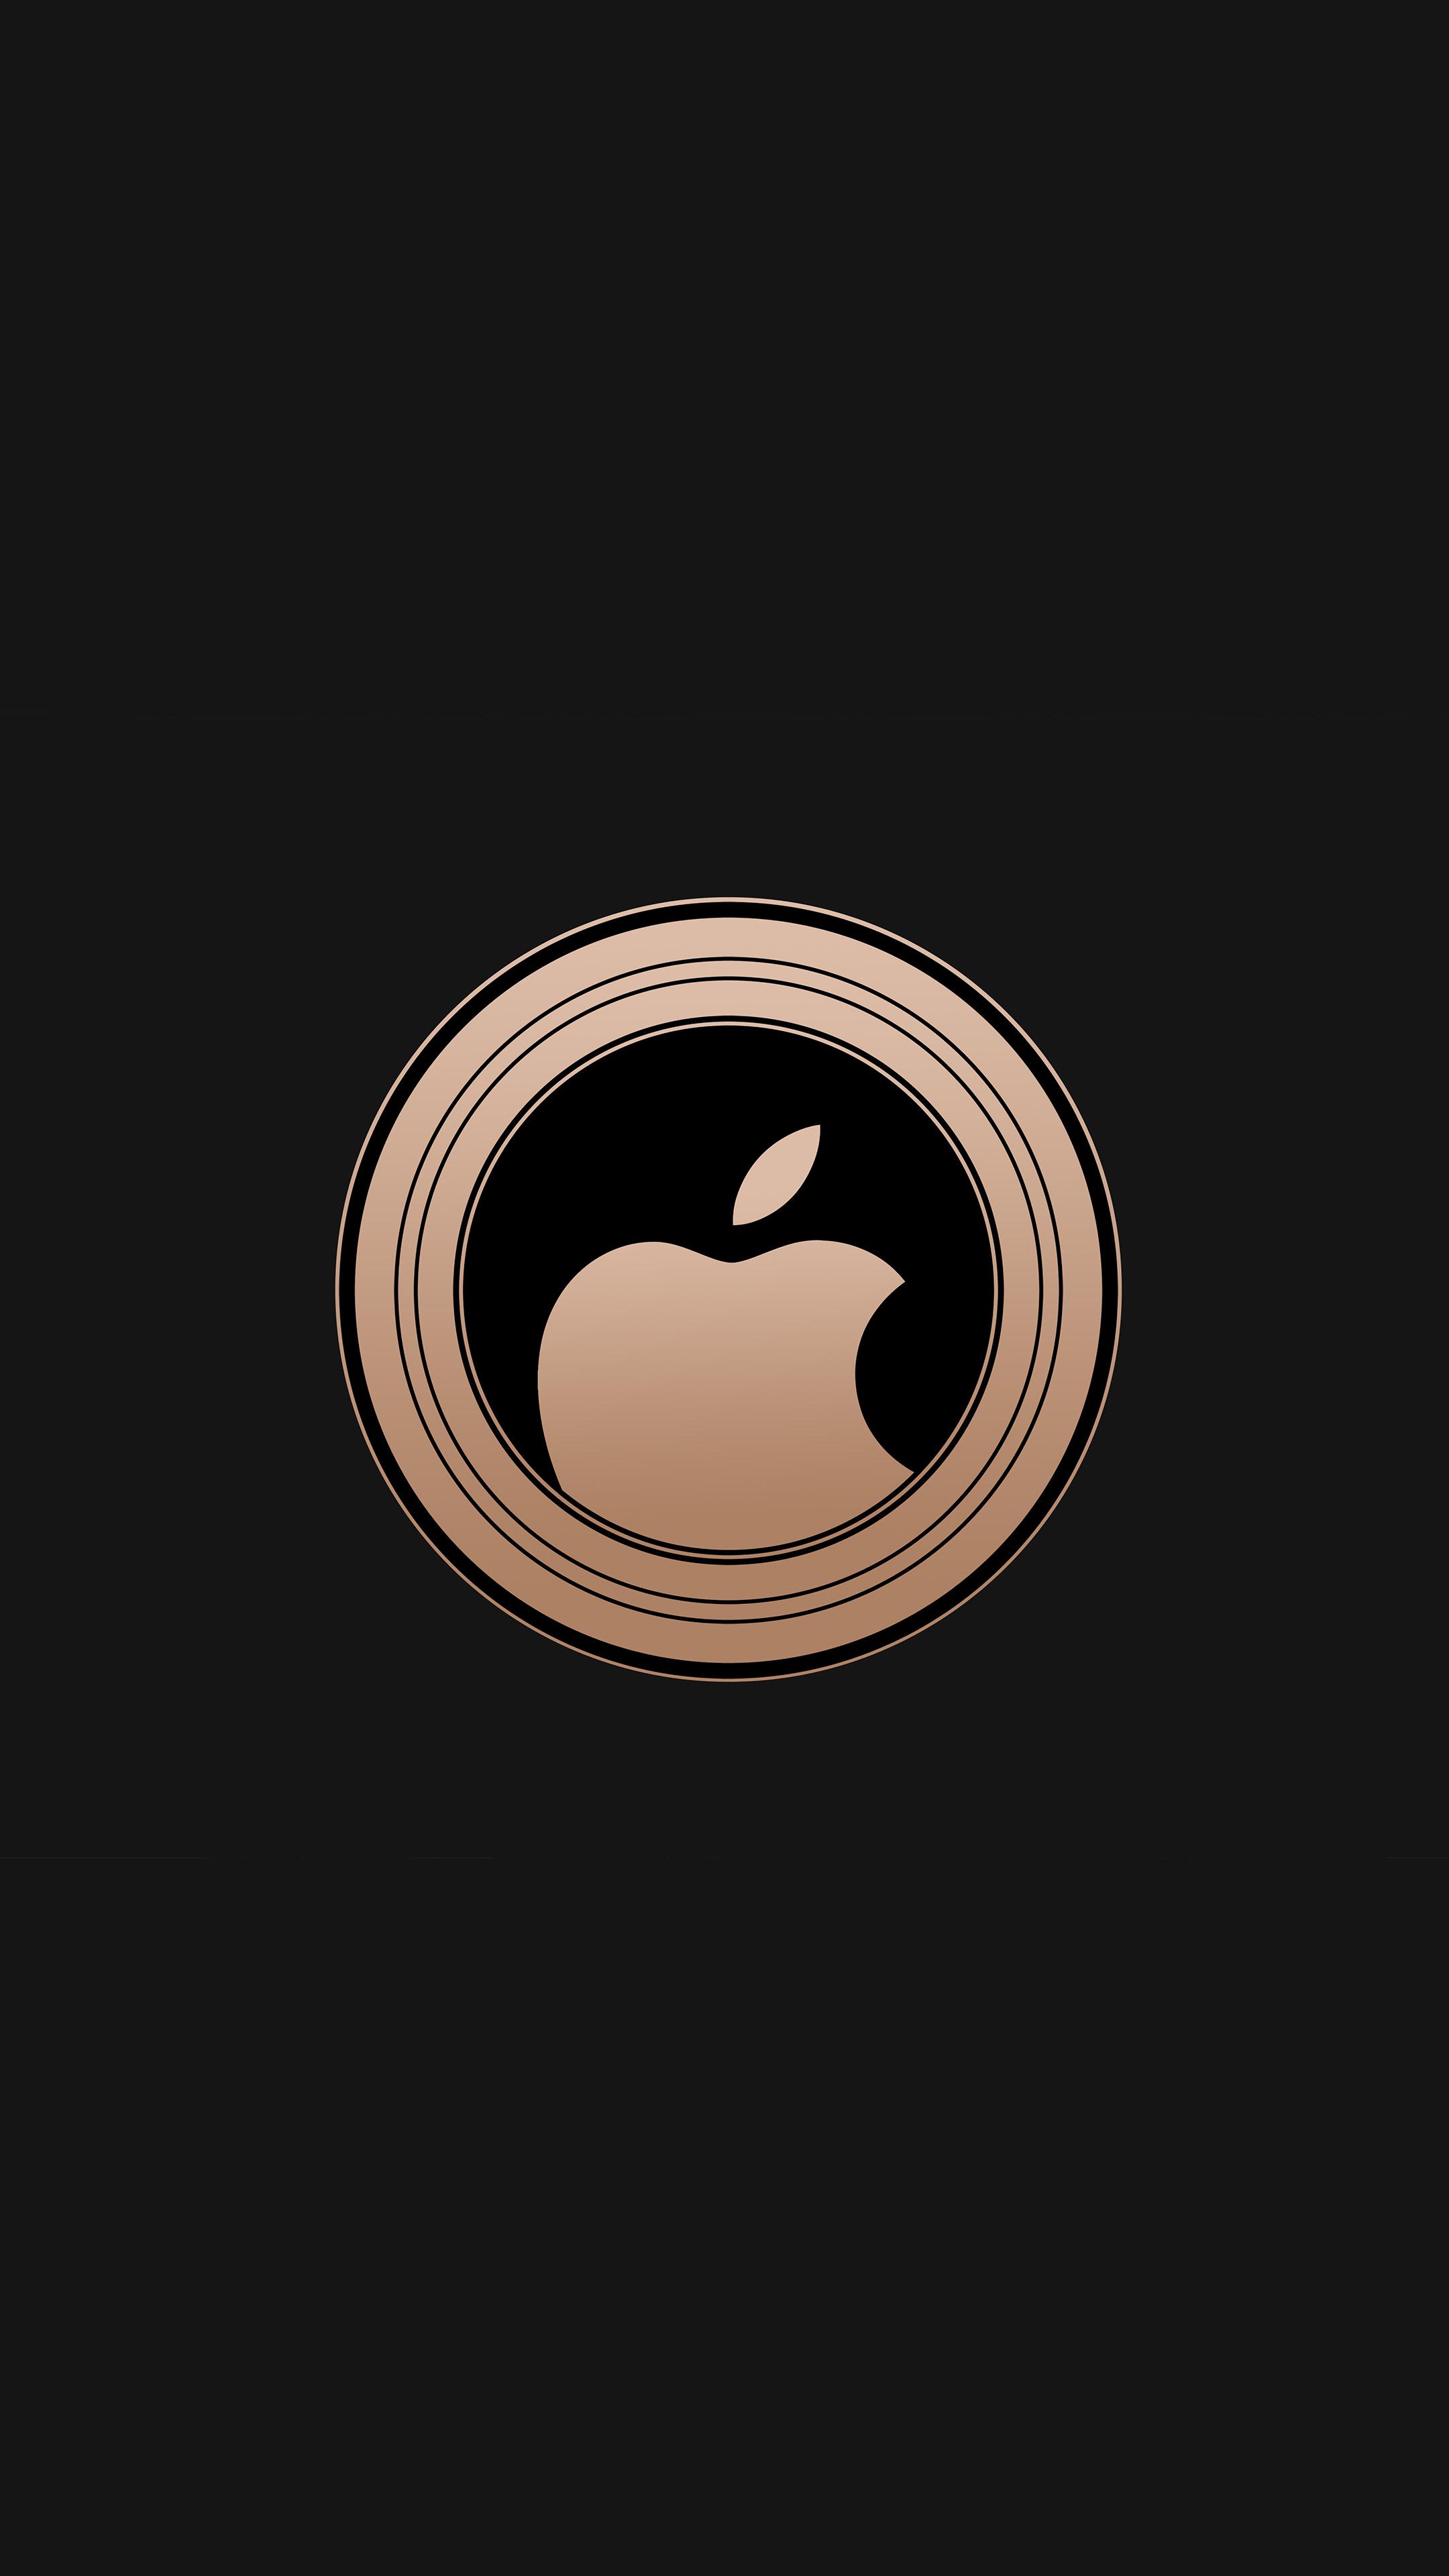 Apple Logo Iphone Xs 4k Ultra Hd Mobile Wallpaper